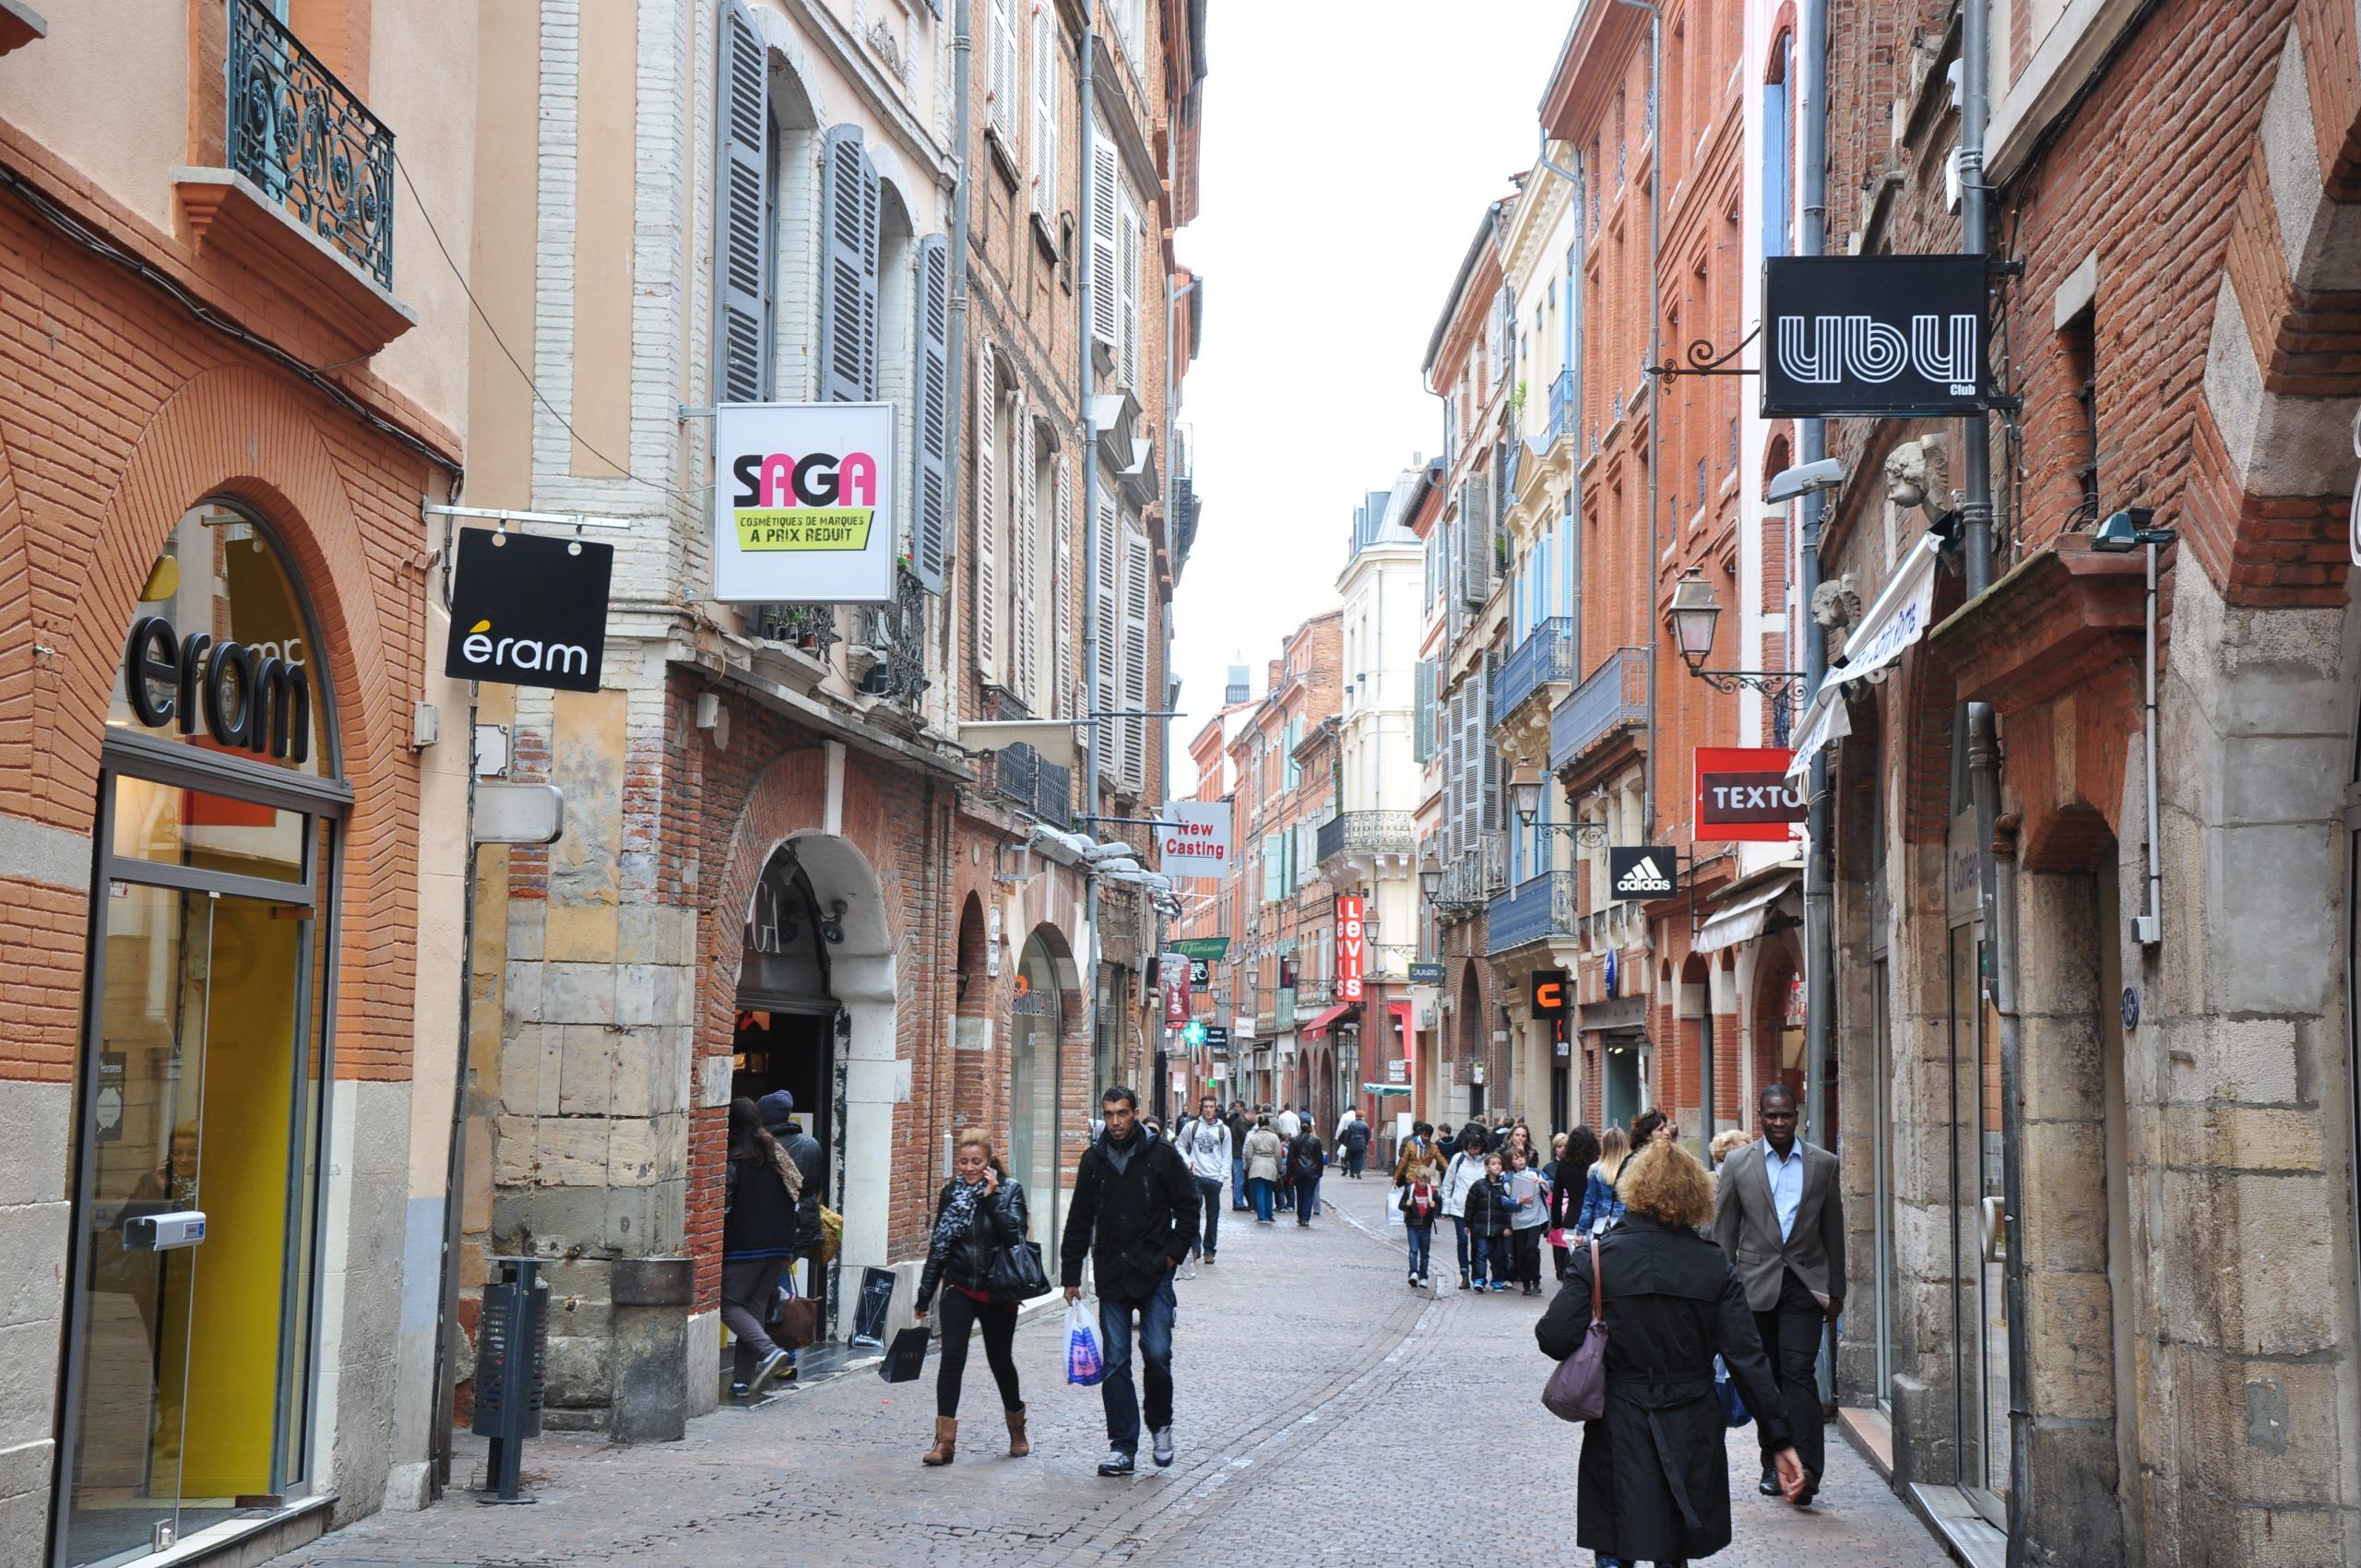 Rue_Saint_Rome,_Toulouse,_Midi-Pyrénées,_France_-_panoramio_(1)